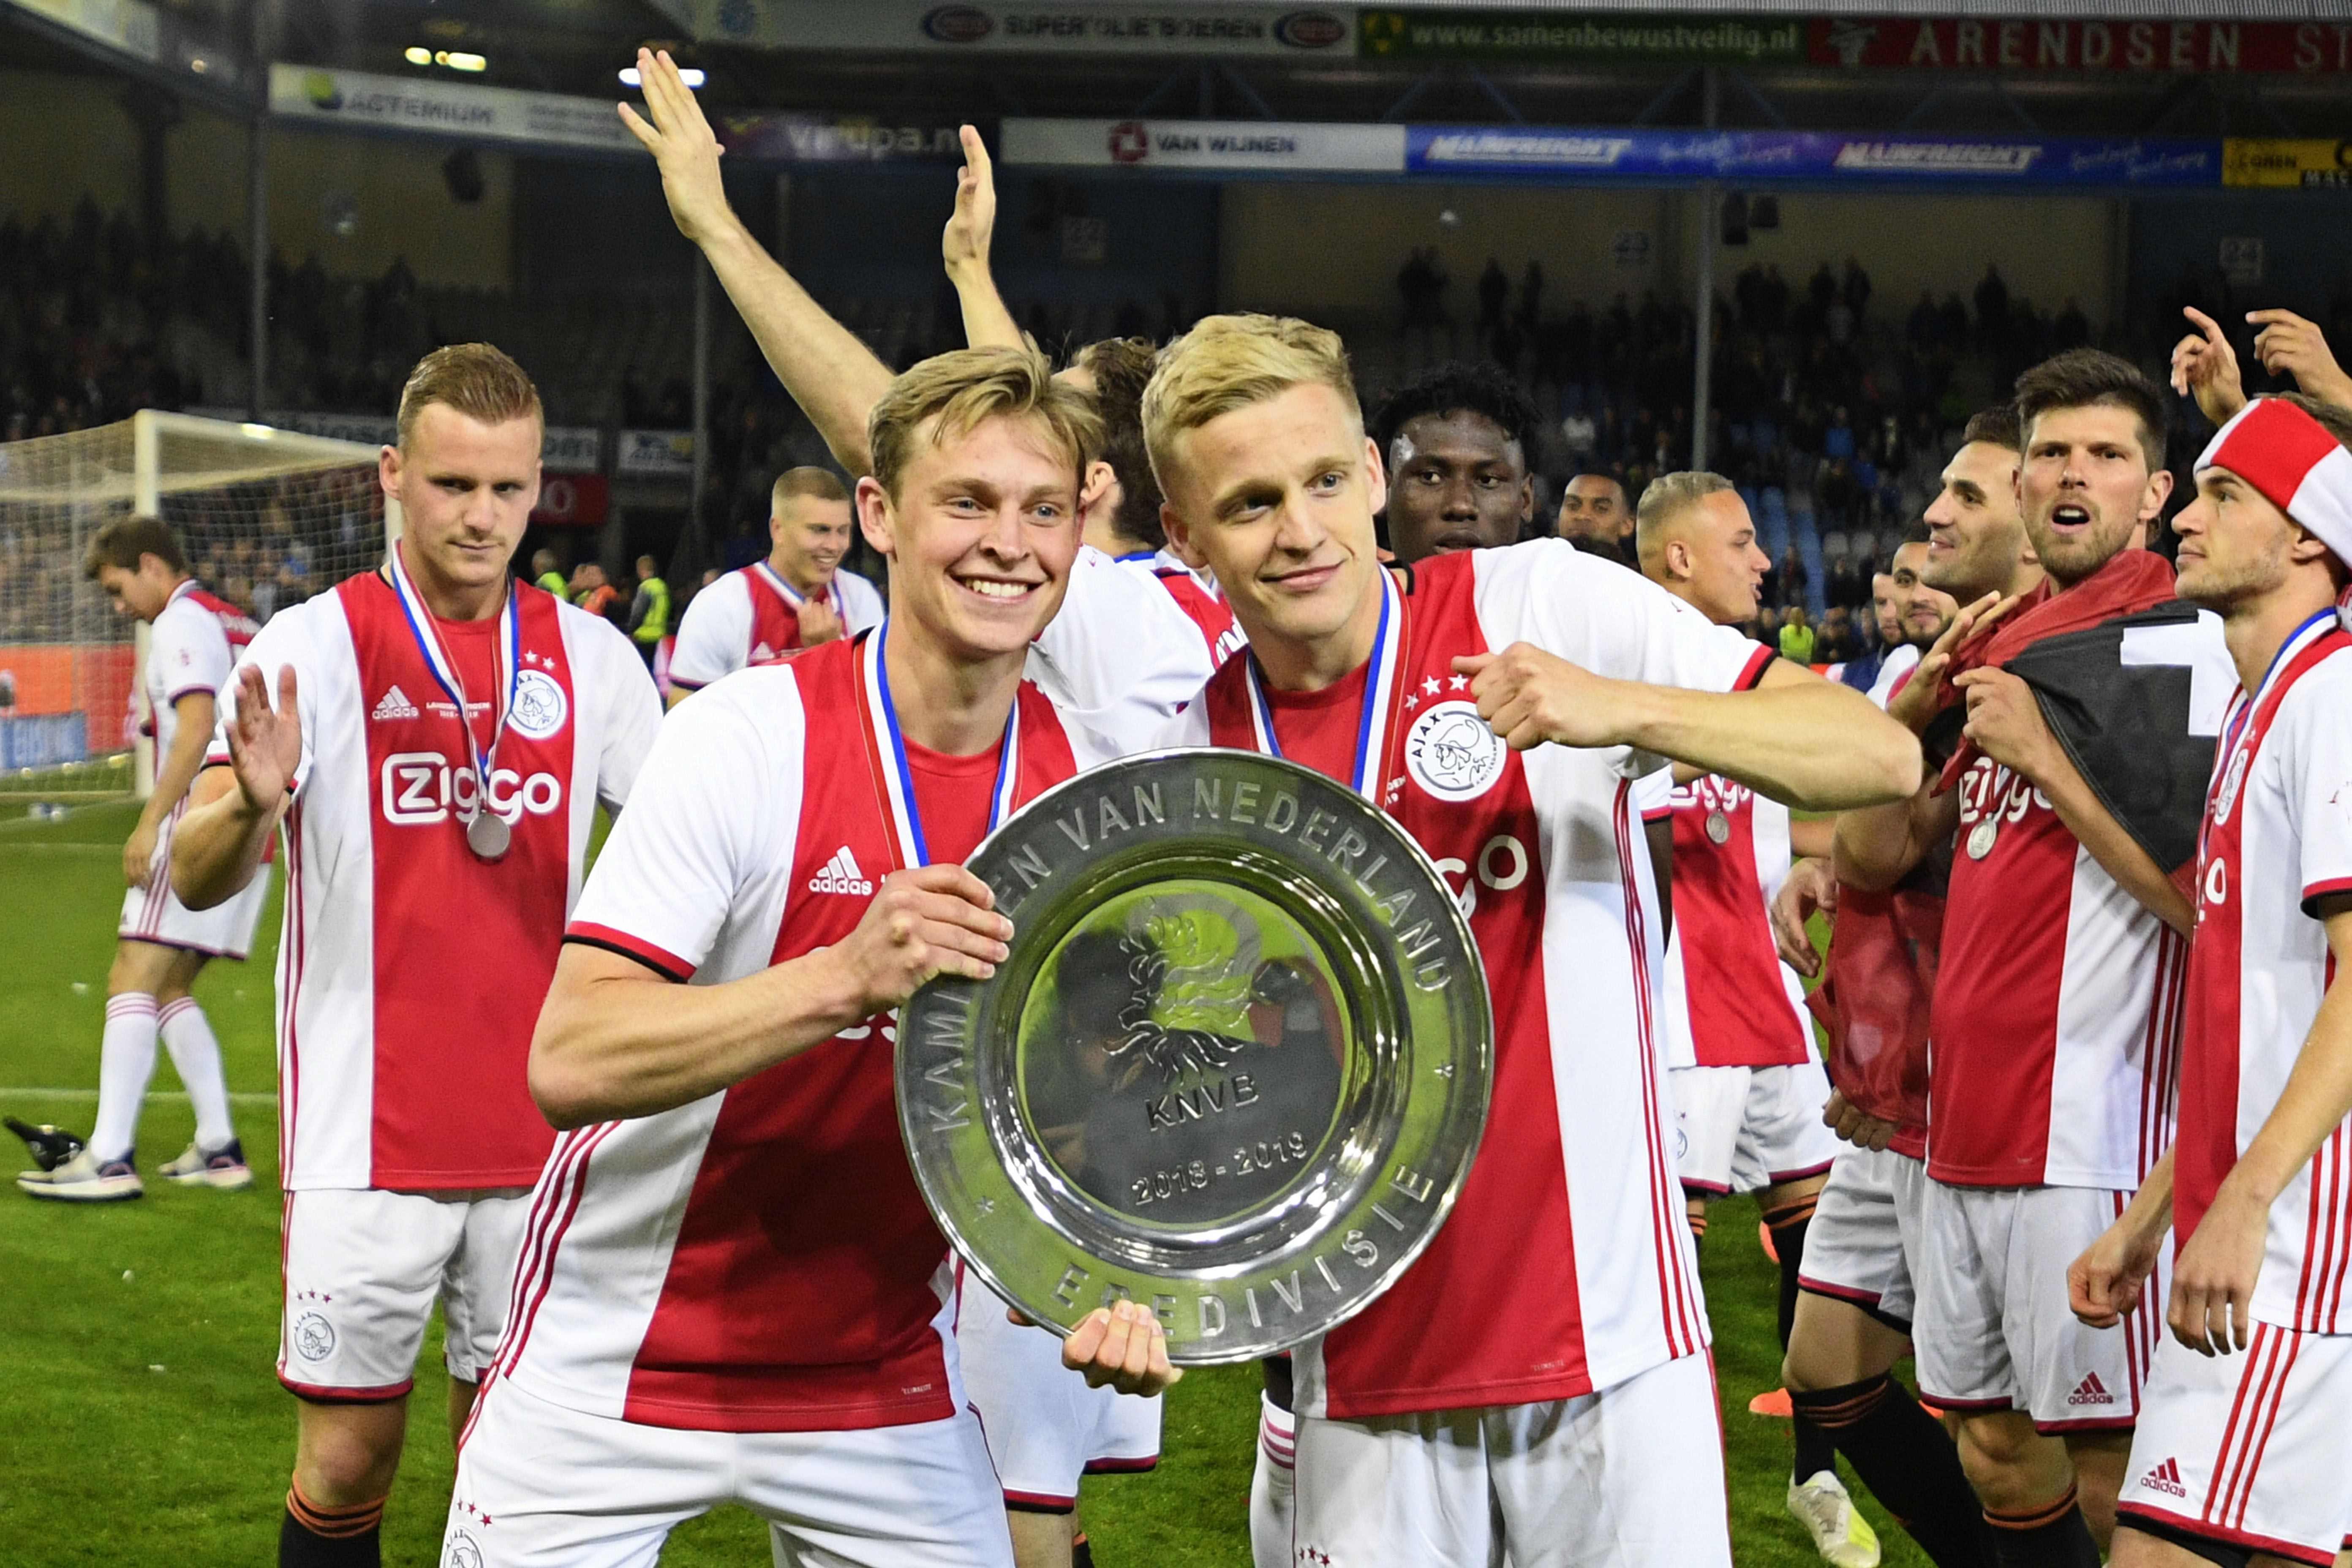 Frenkie de Jong (izquierda) celebra junto a Donny van de Beek la liga holandesa. (Foto Prensa Libre: AFP)